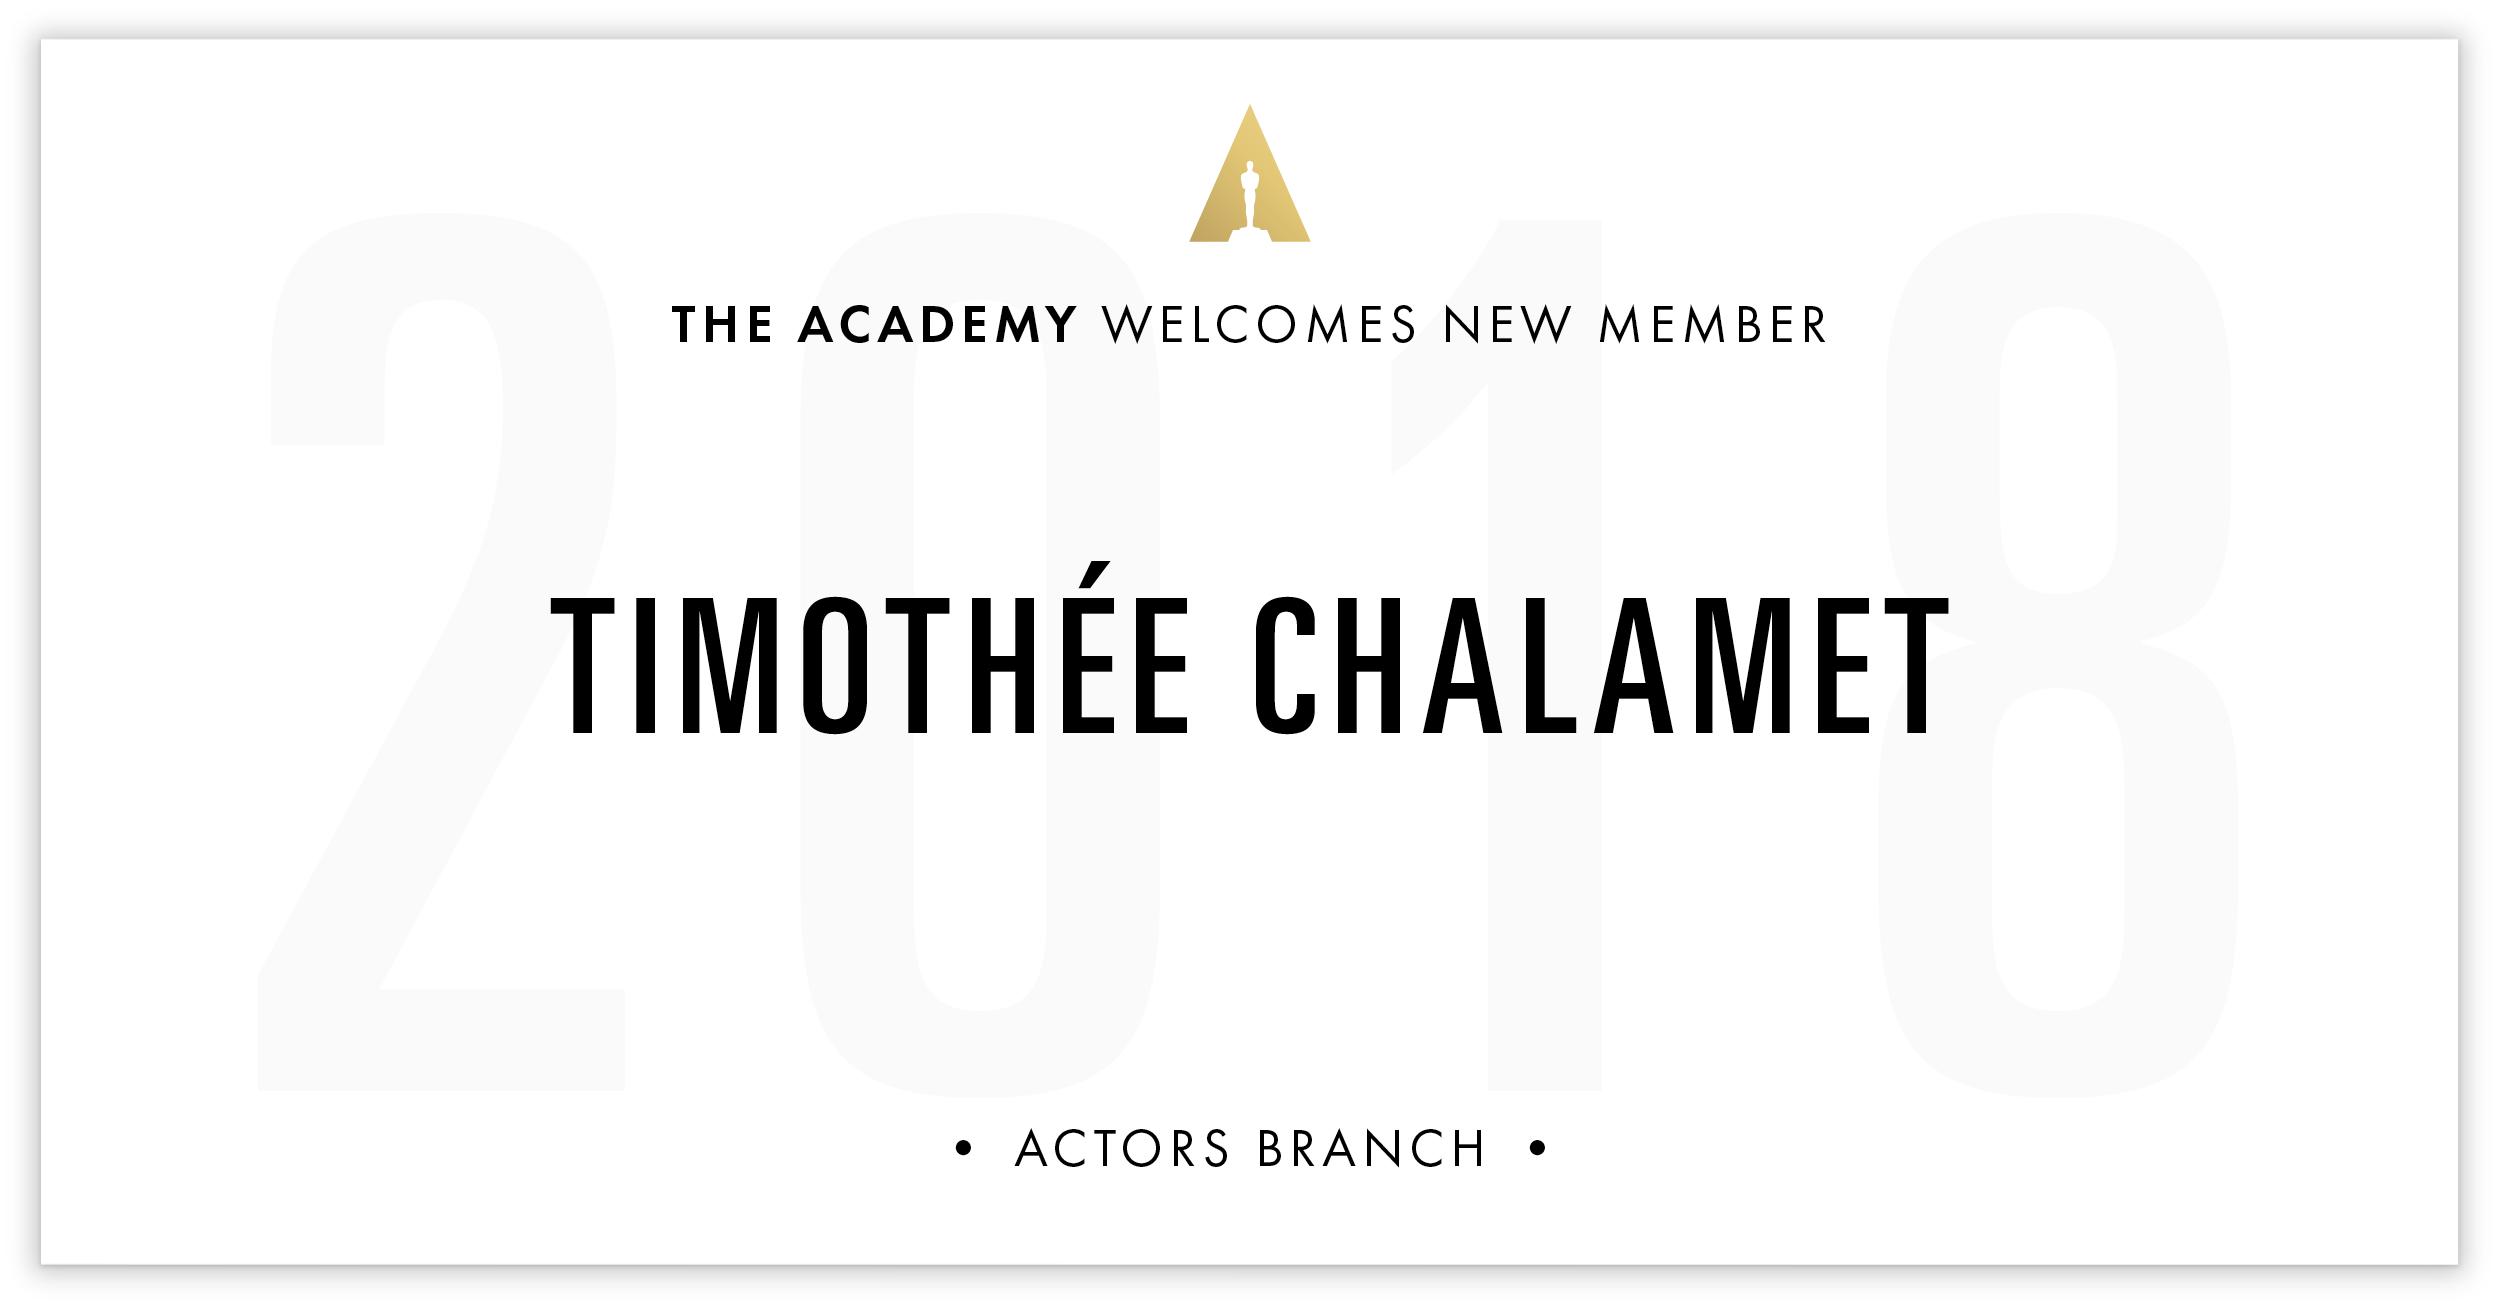 Timothée Chalamet is invited!